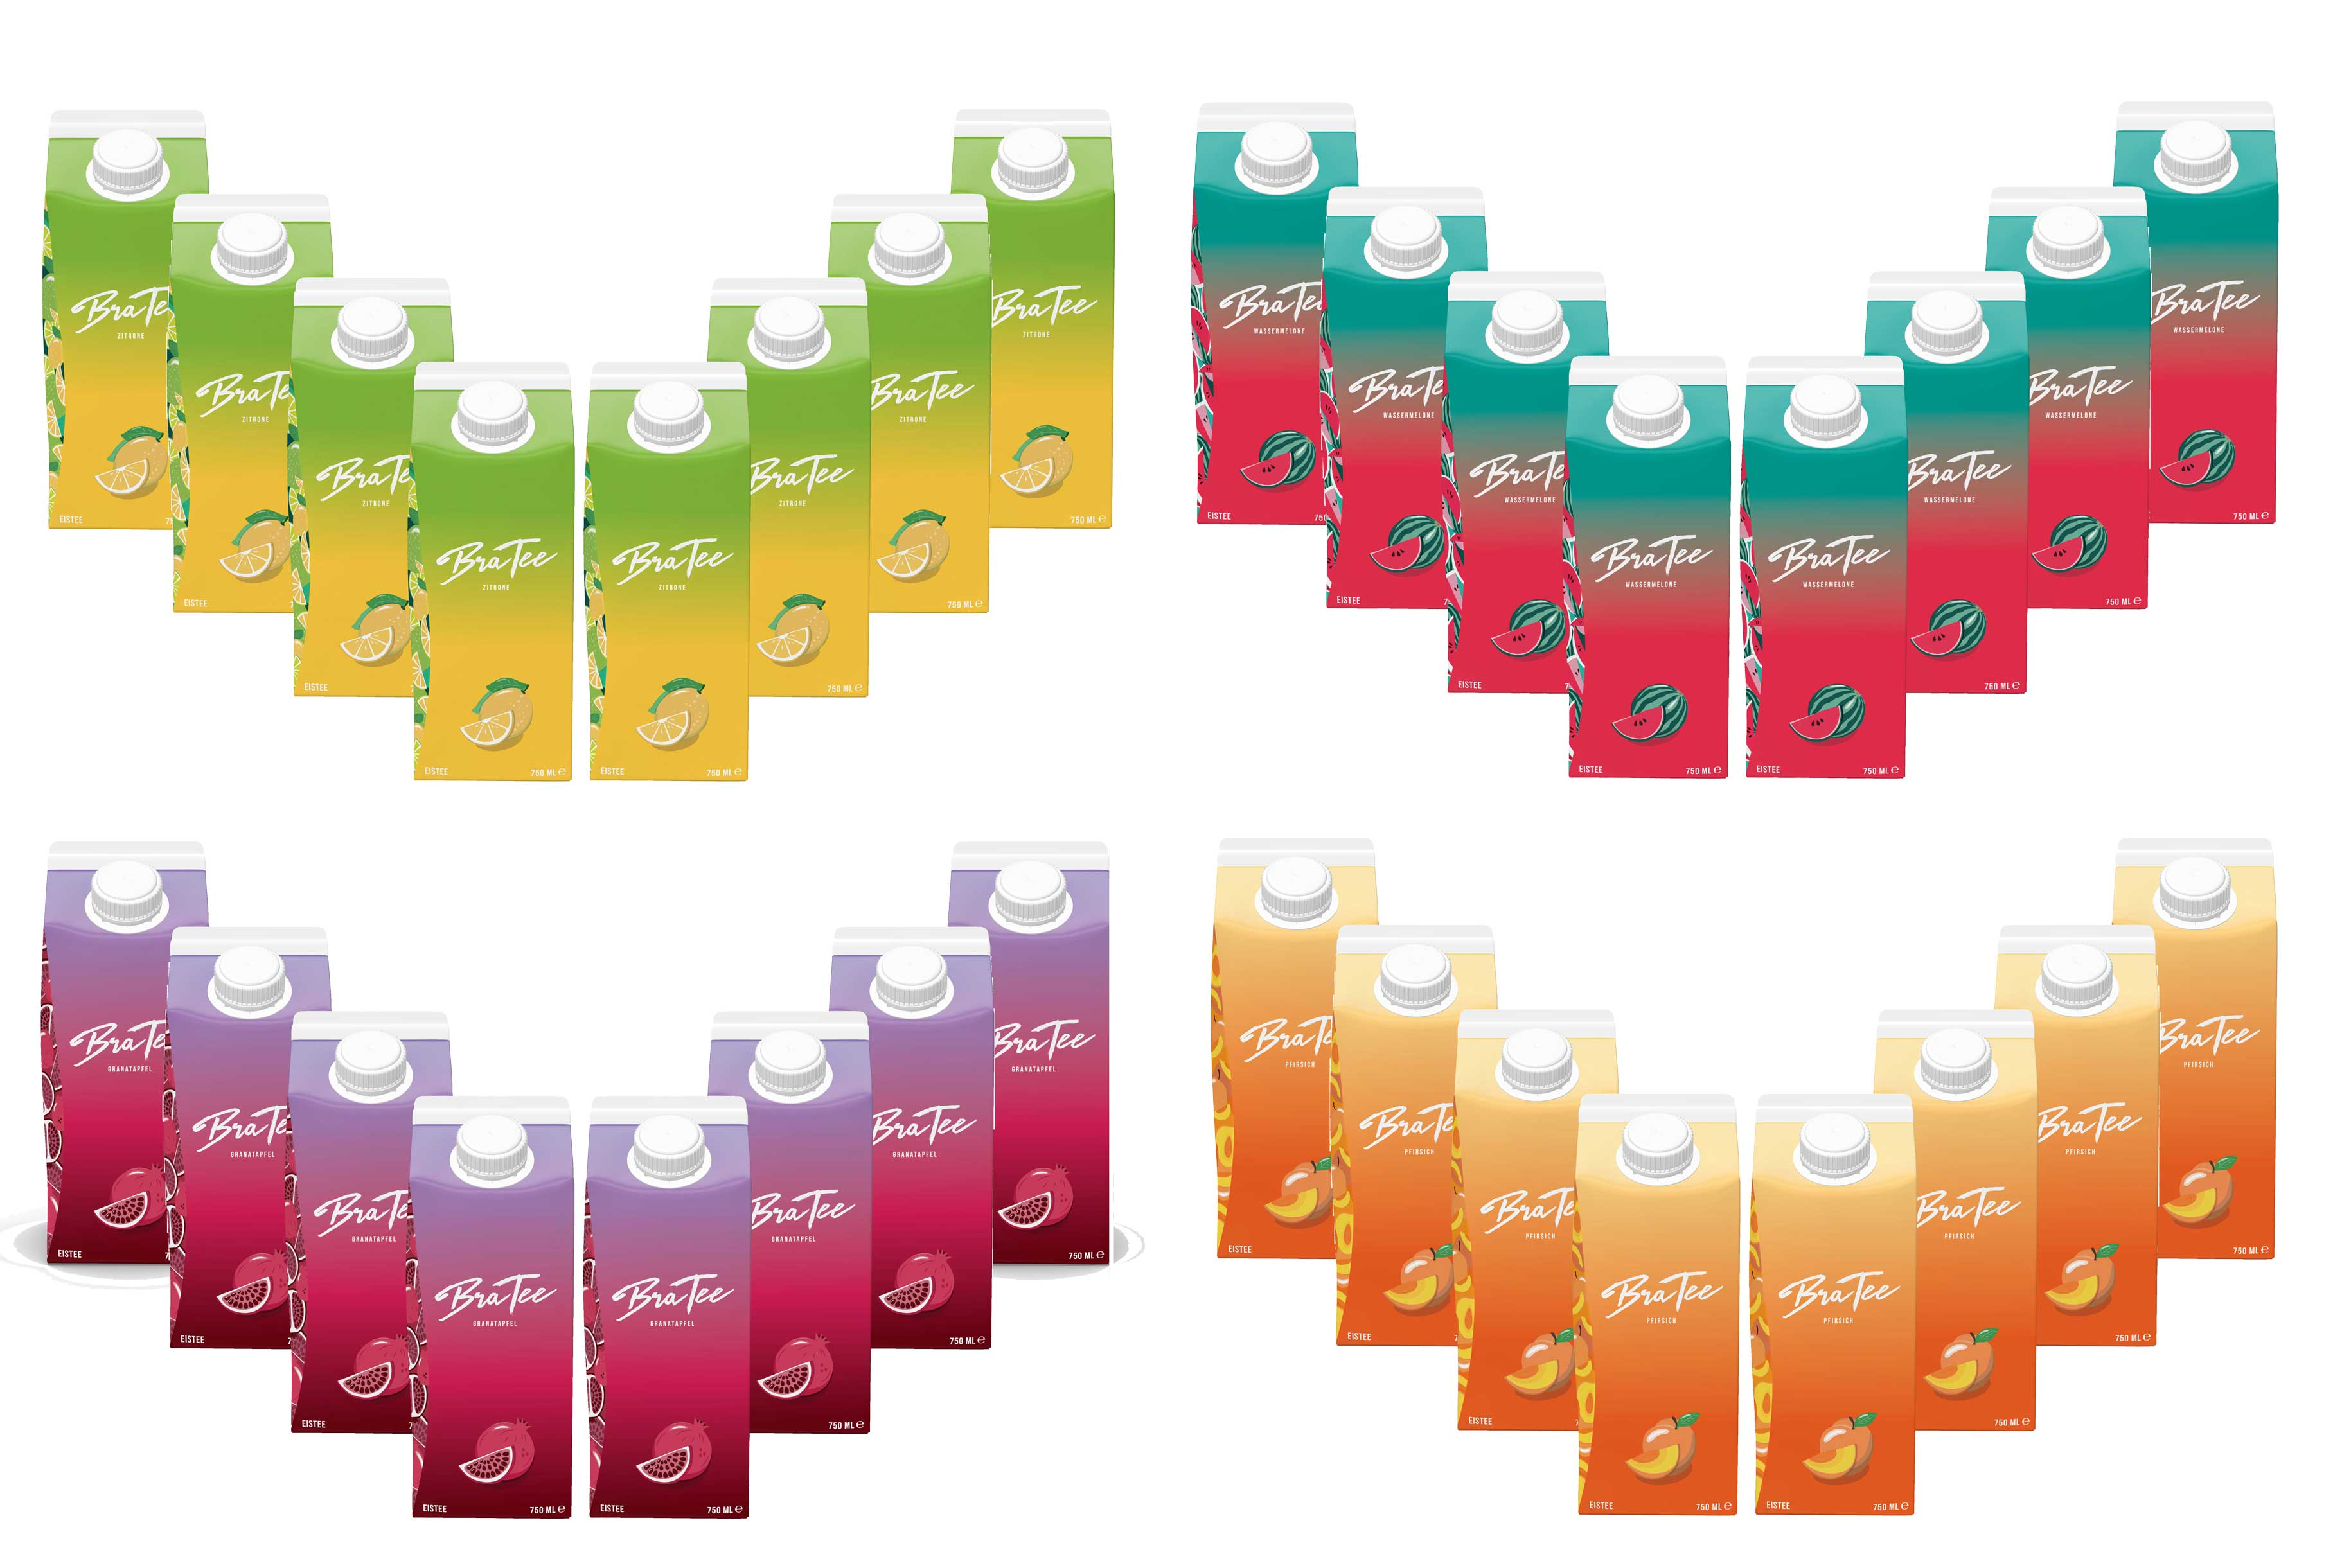 Capital BraTee 32er Tasting Set 8 pro Geschmackssorte Eistee je 750ml BRATEE Ice tea 8x Wassermelone 8x Zitrone 8x Pfirsich 8x Granatapfel - mit Capi-Qualitäts-Siegel